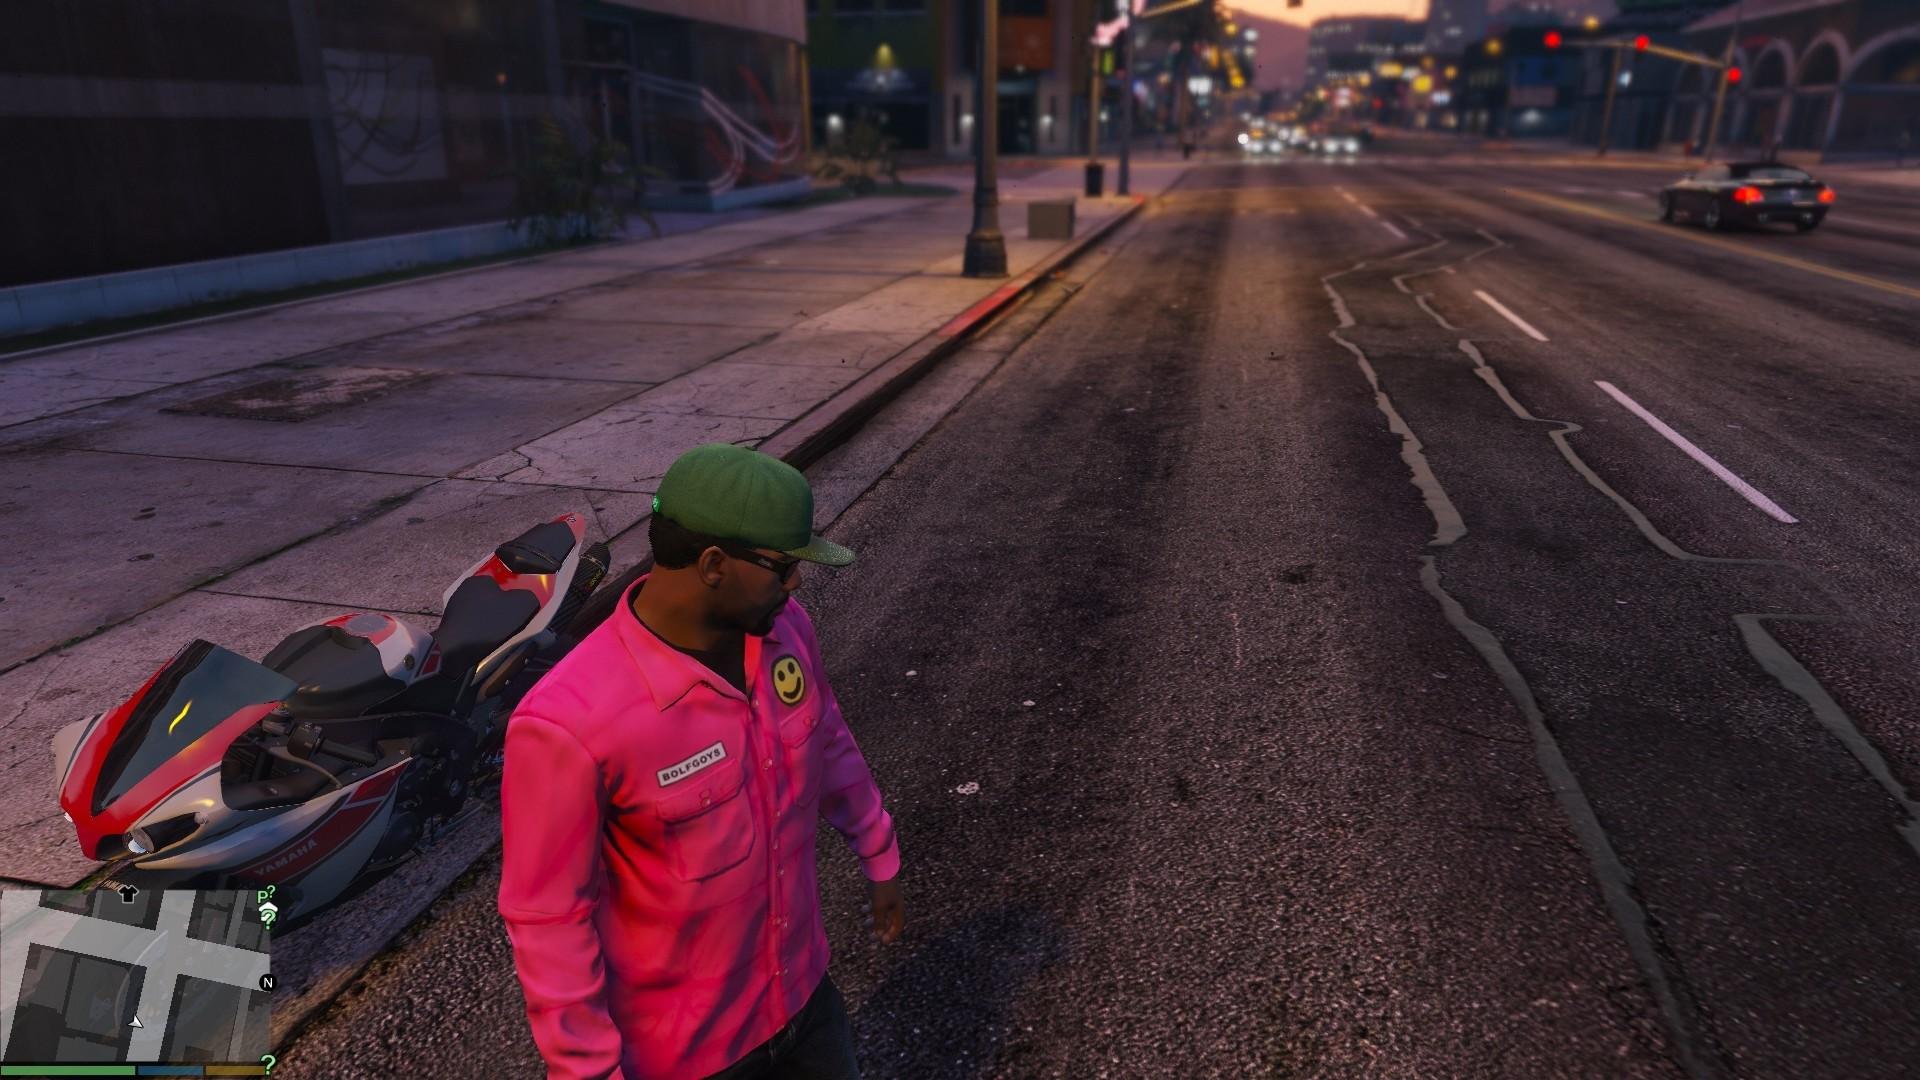 Bolf Goys Nylon Spring Slim Fit Jacket Pink (Golf Wang)